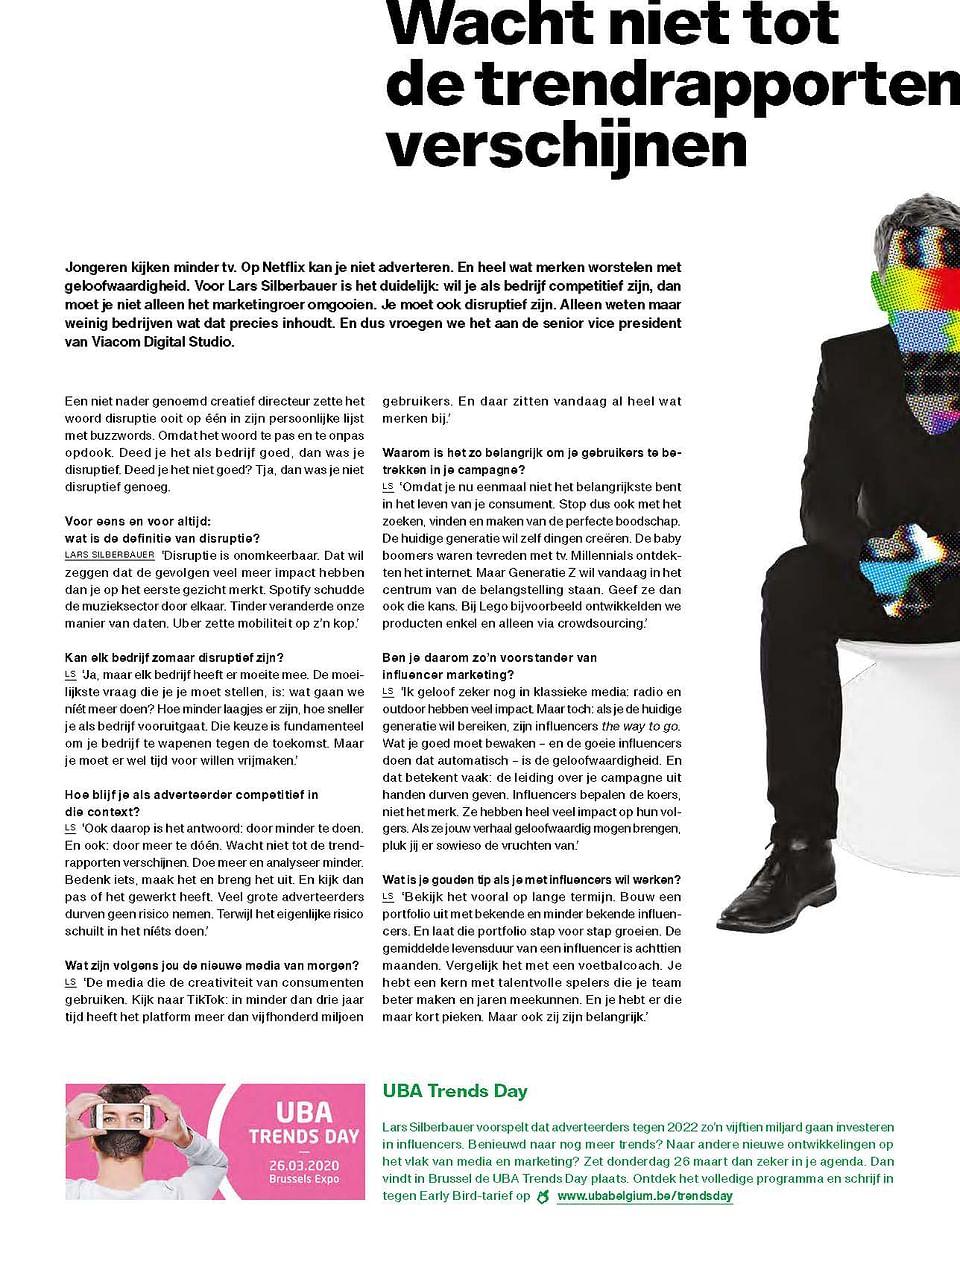 Artikel voor bpost | Sparkle n° 12